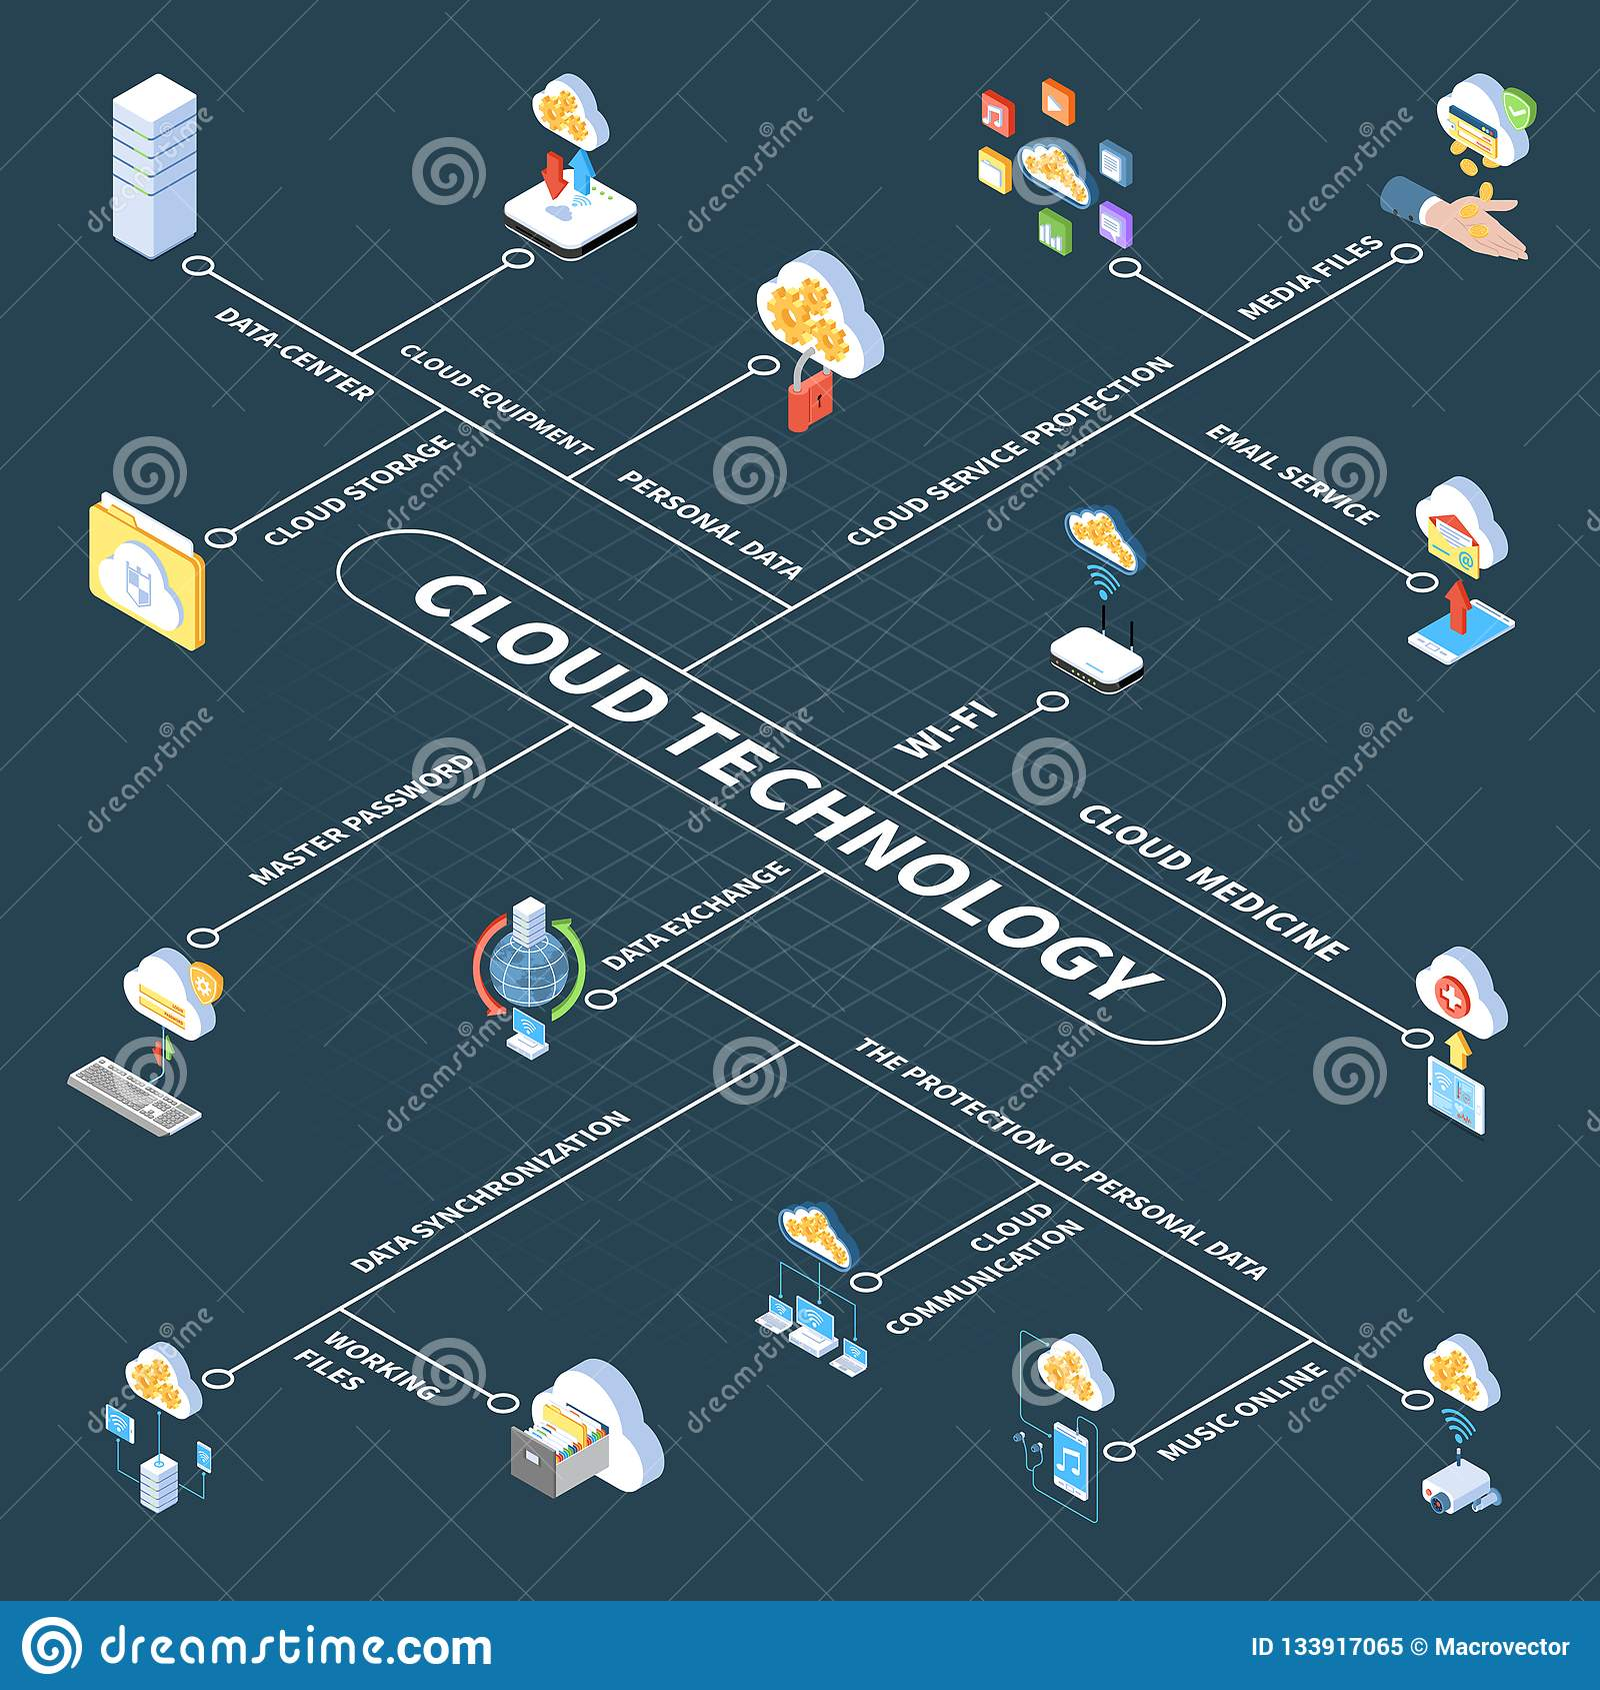 Cloud Technology Isometric Flowchart